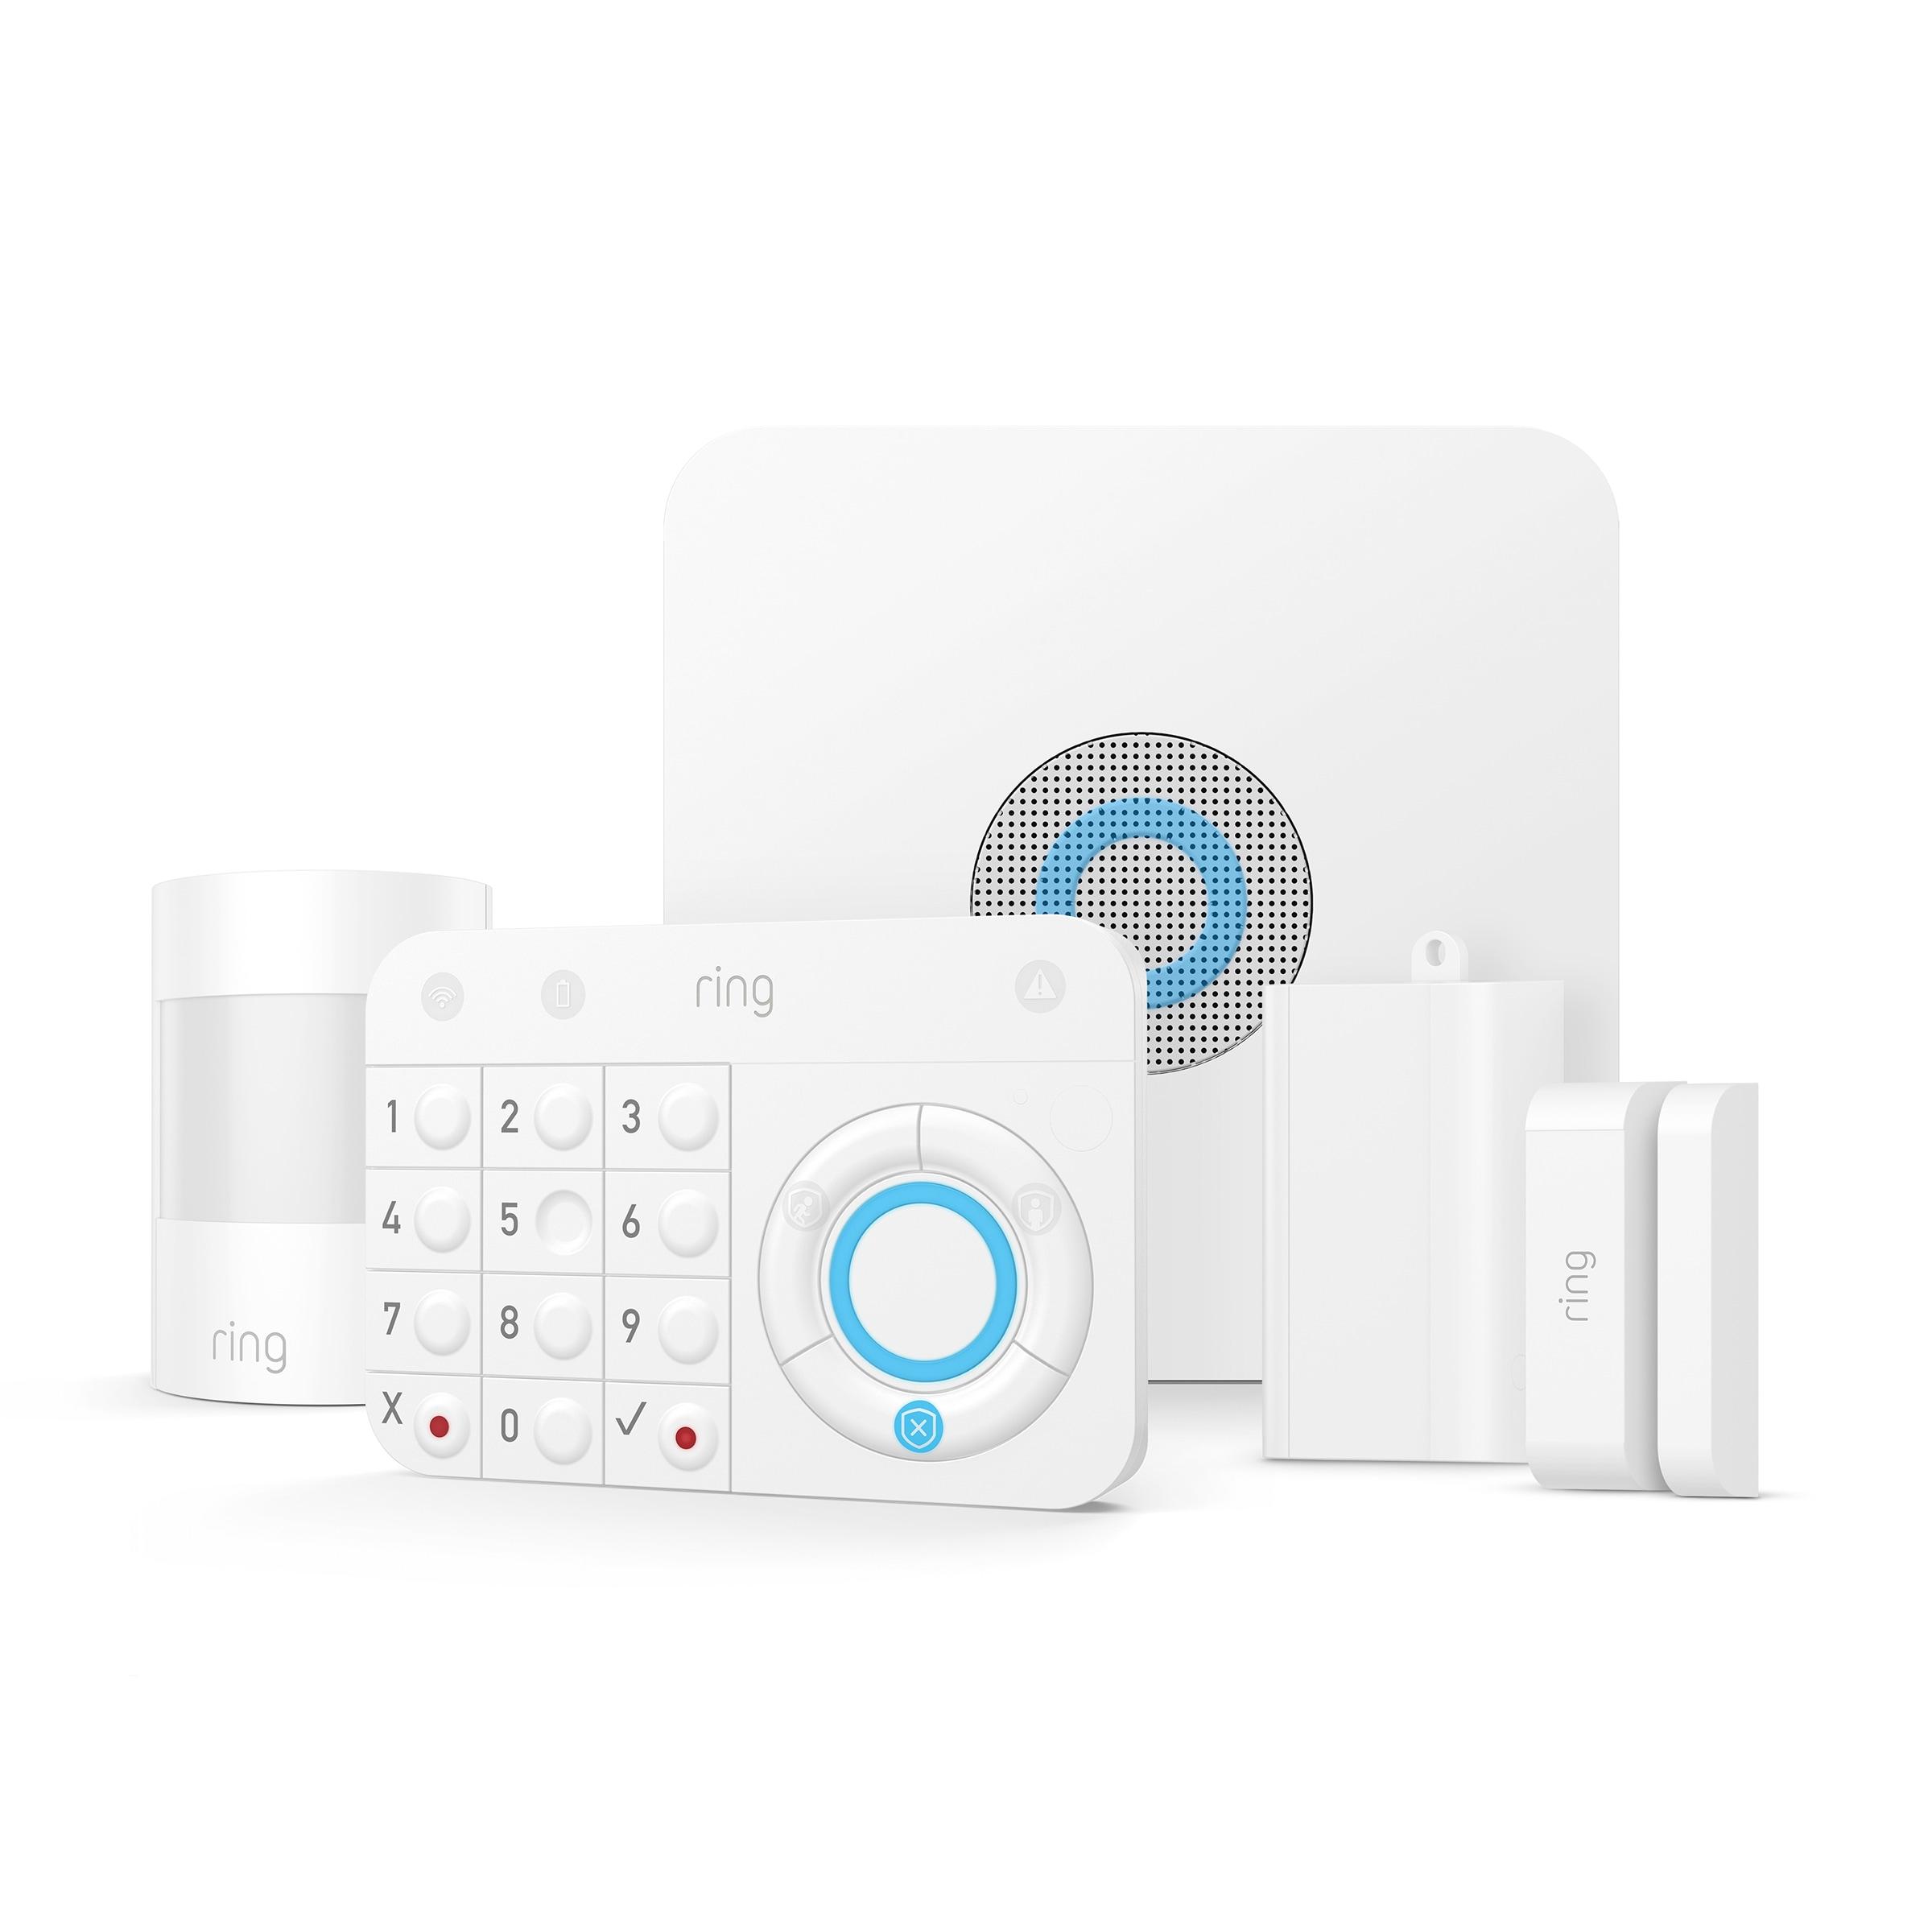 Ring Alarm Starter Kit, Home Alarm Systems and Sensors